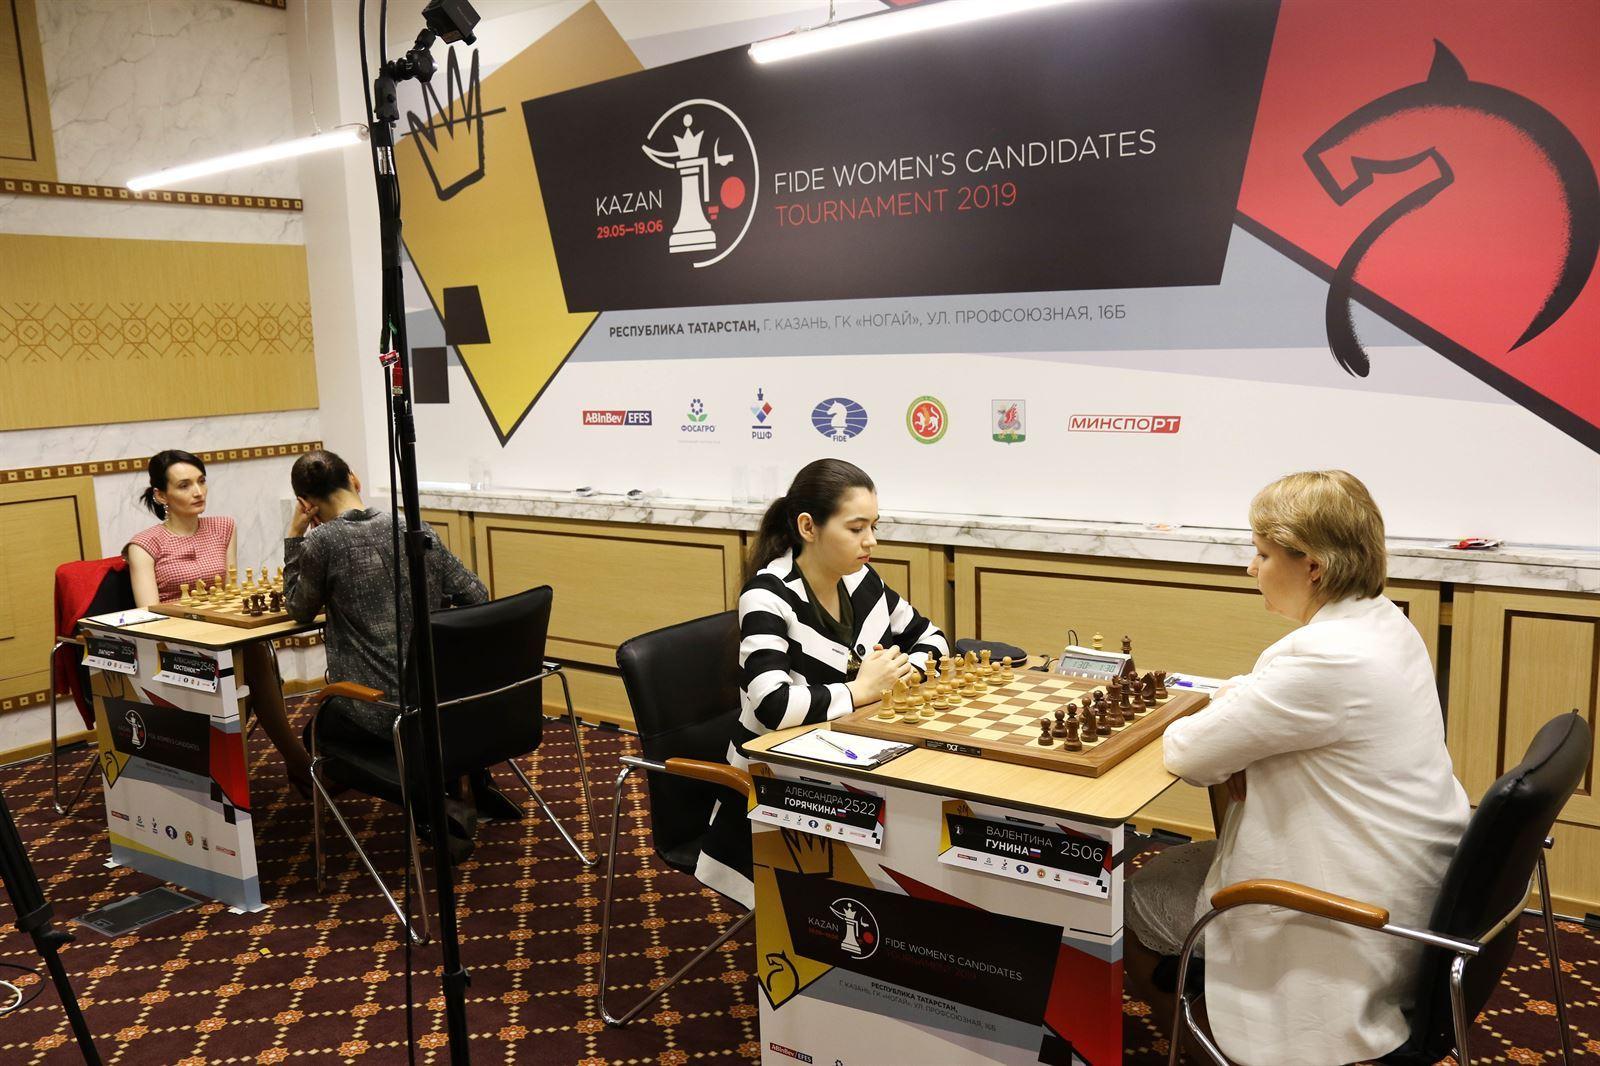 Photos - FIDE Women's Candidates Tournament 2019 / Kazan